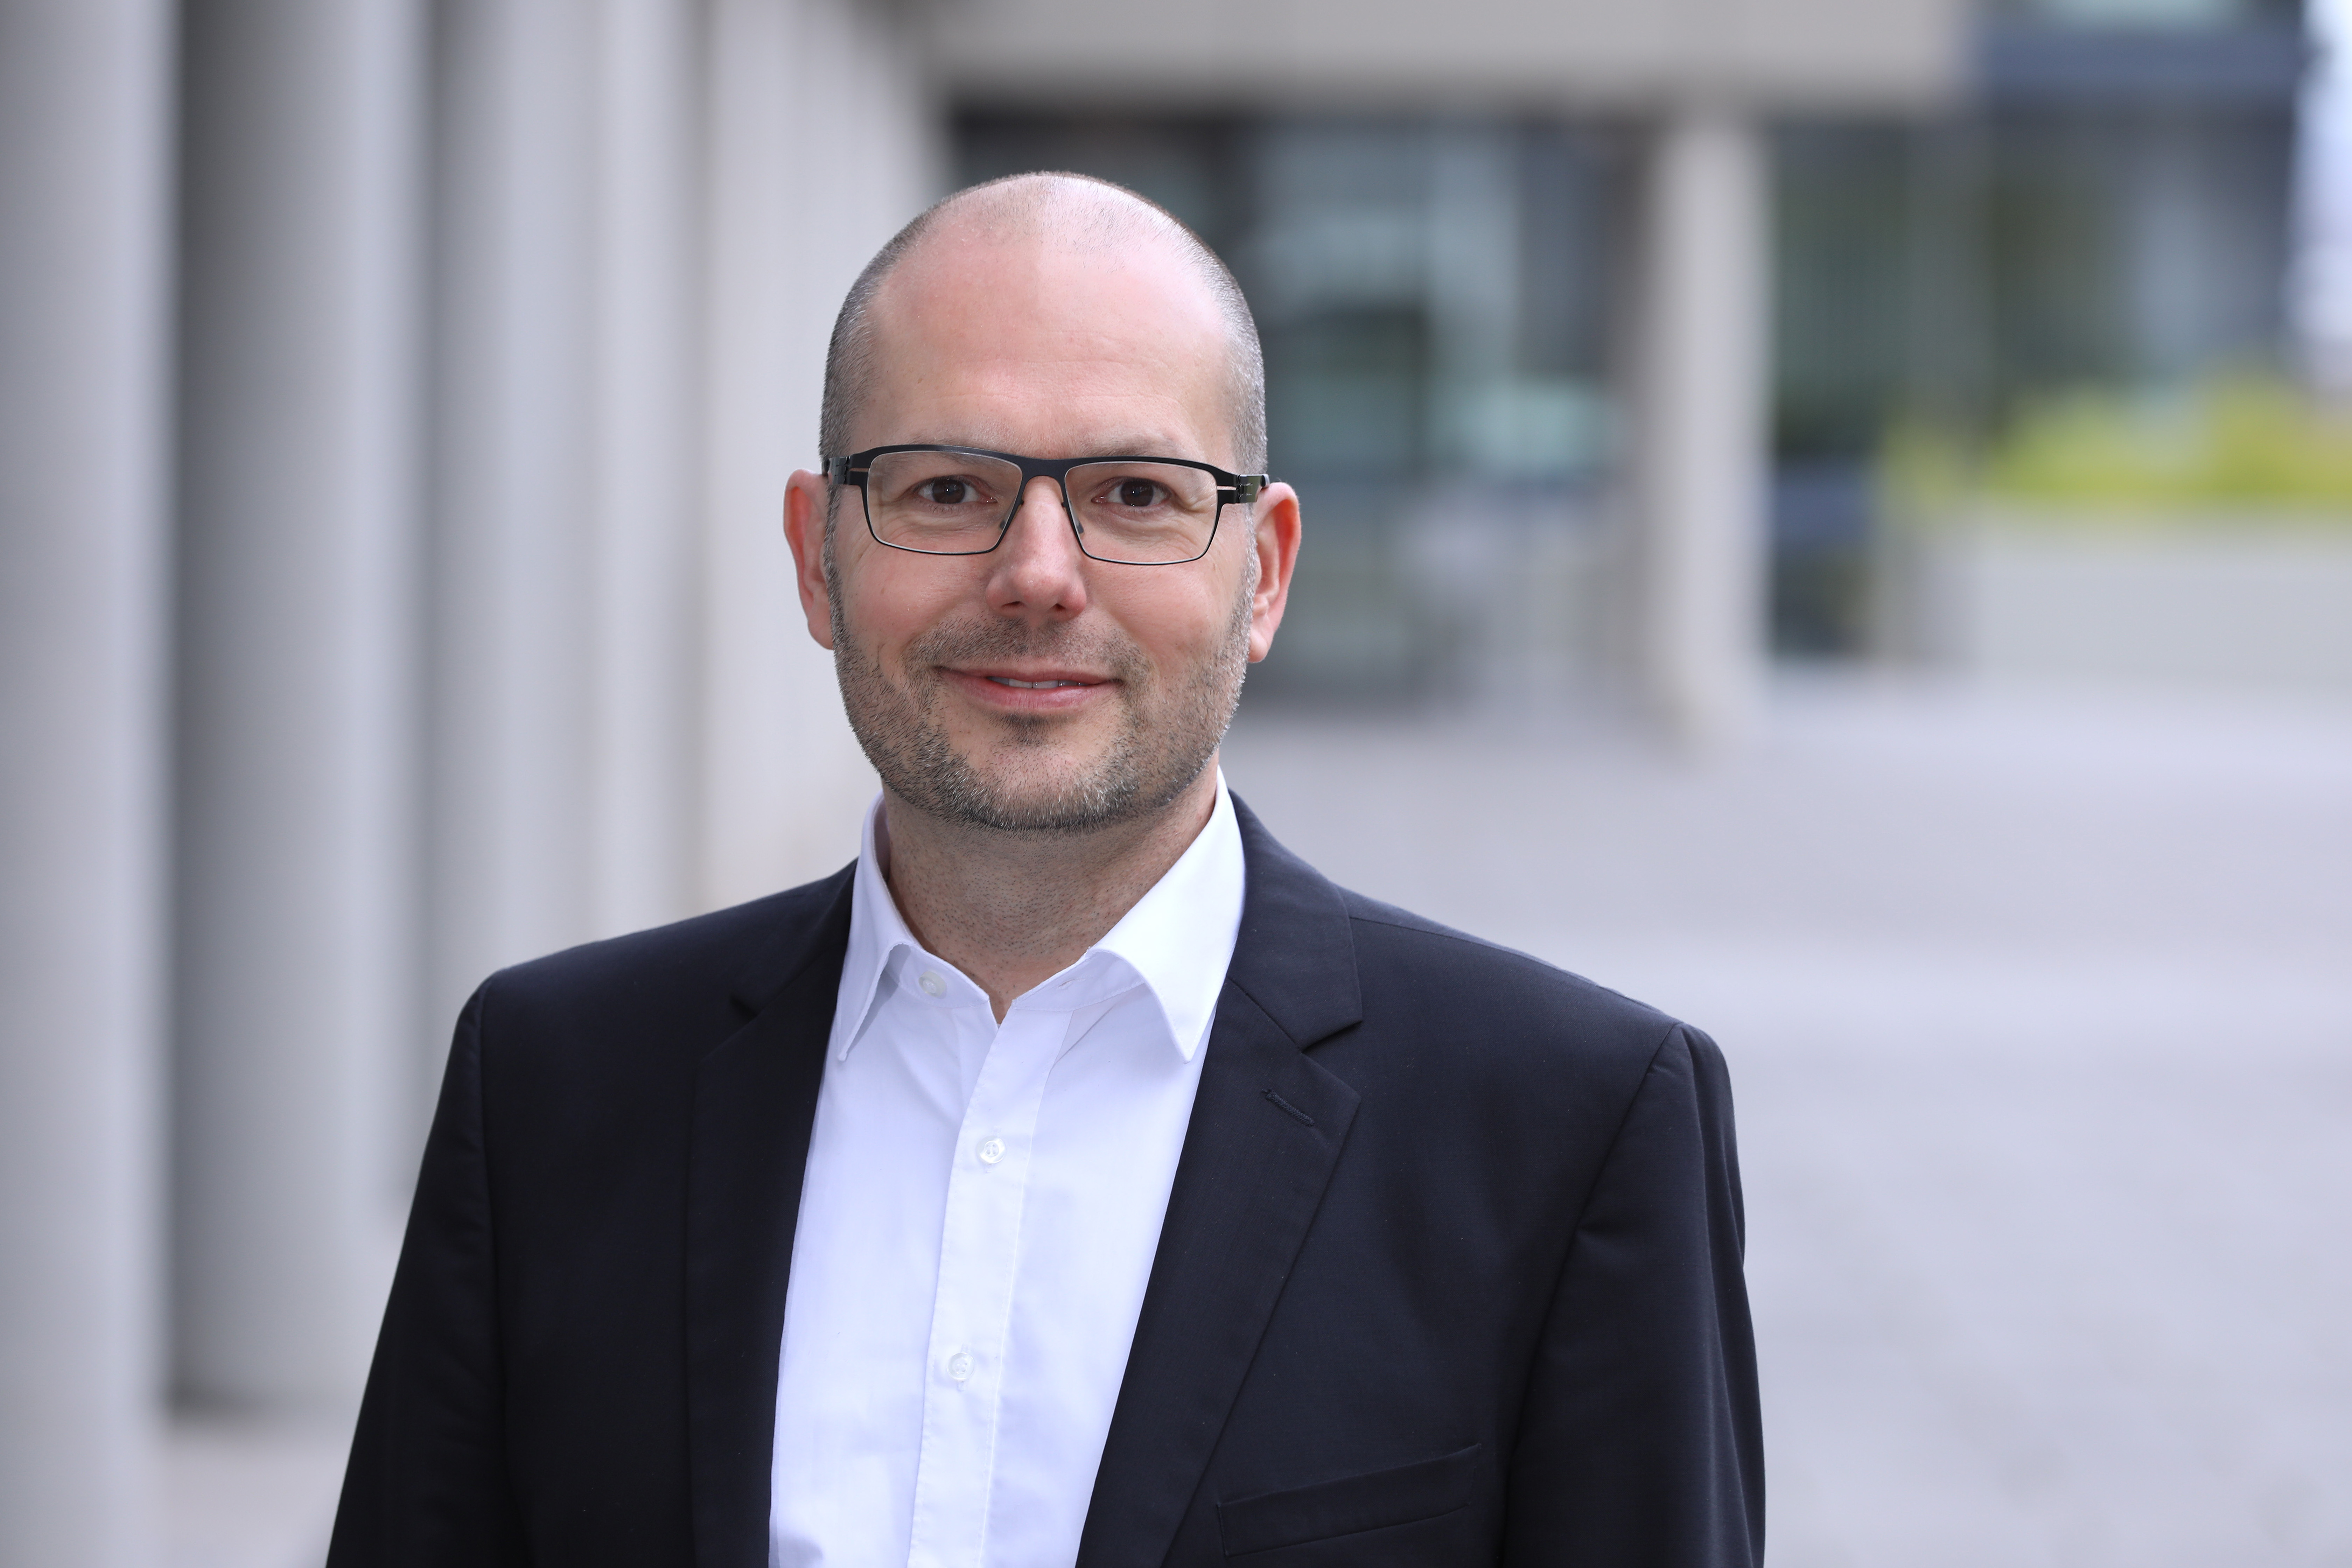 Prof. Dr. Martin Ruskowski. Bild: A. Sell